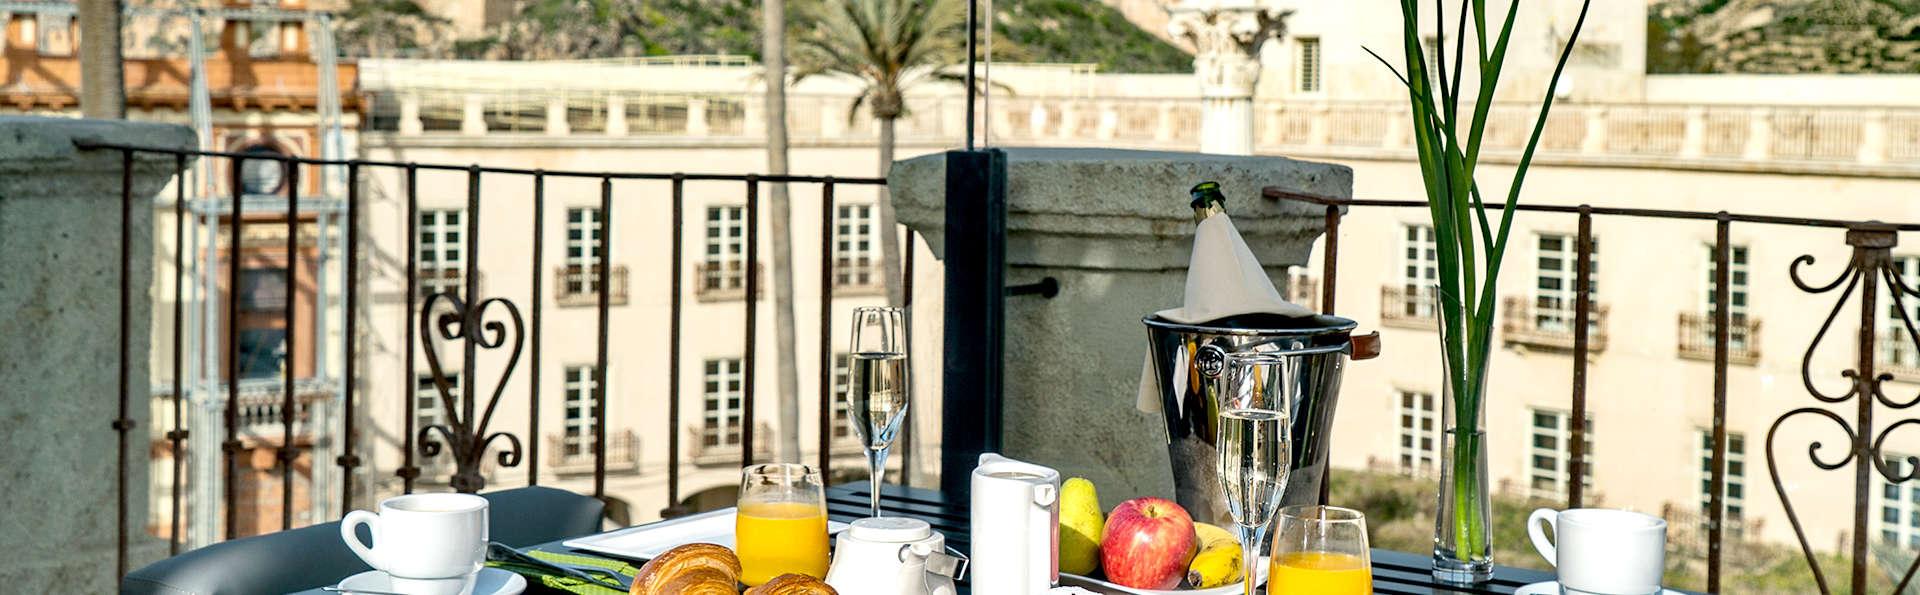 Aire Hotel & Ancient Baths  - Edit_Terrace.jpg